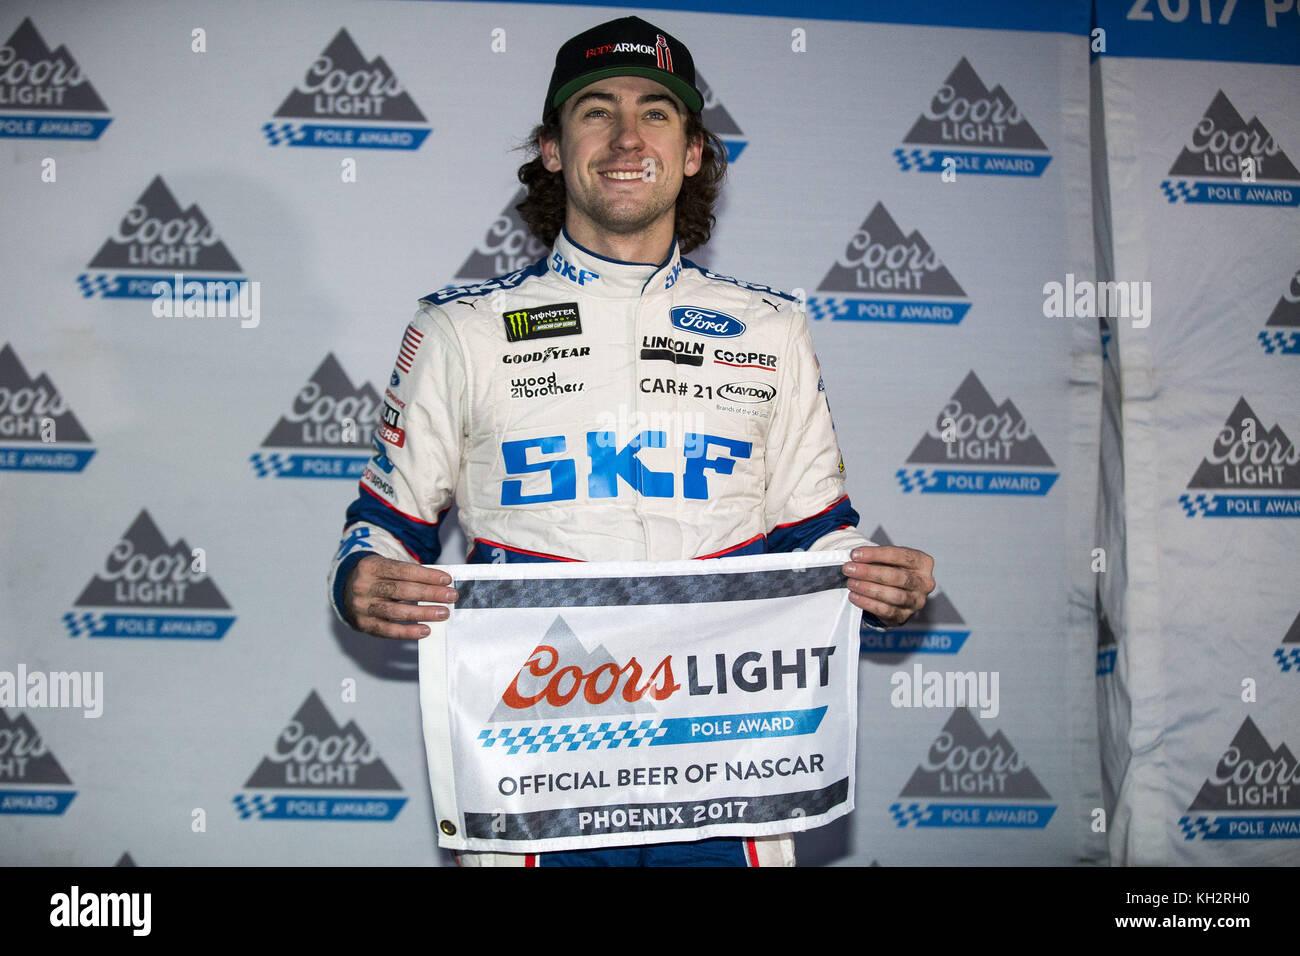 Avondale, Arizona, USA. 10th Nov, 2017. November 10, 2017 - Avondale, Arizona, USA: Ryan Blaney (21) wins the pole - Stock Image